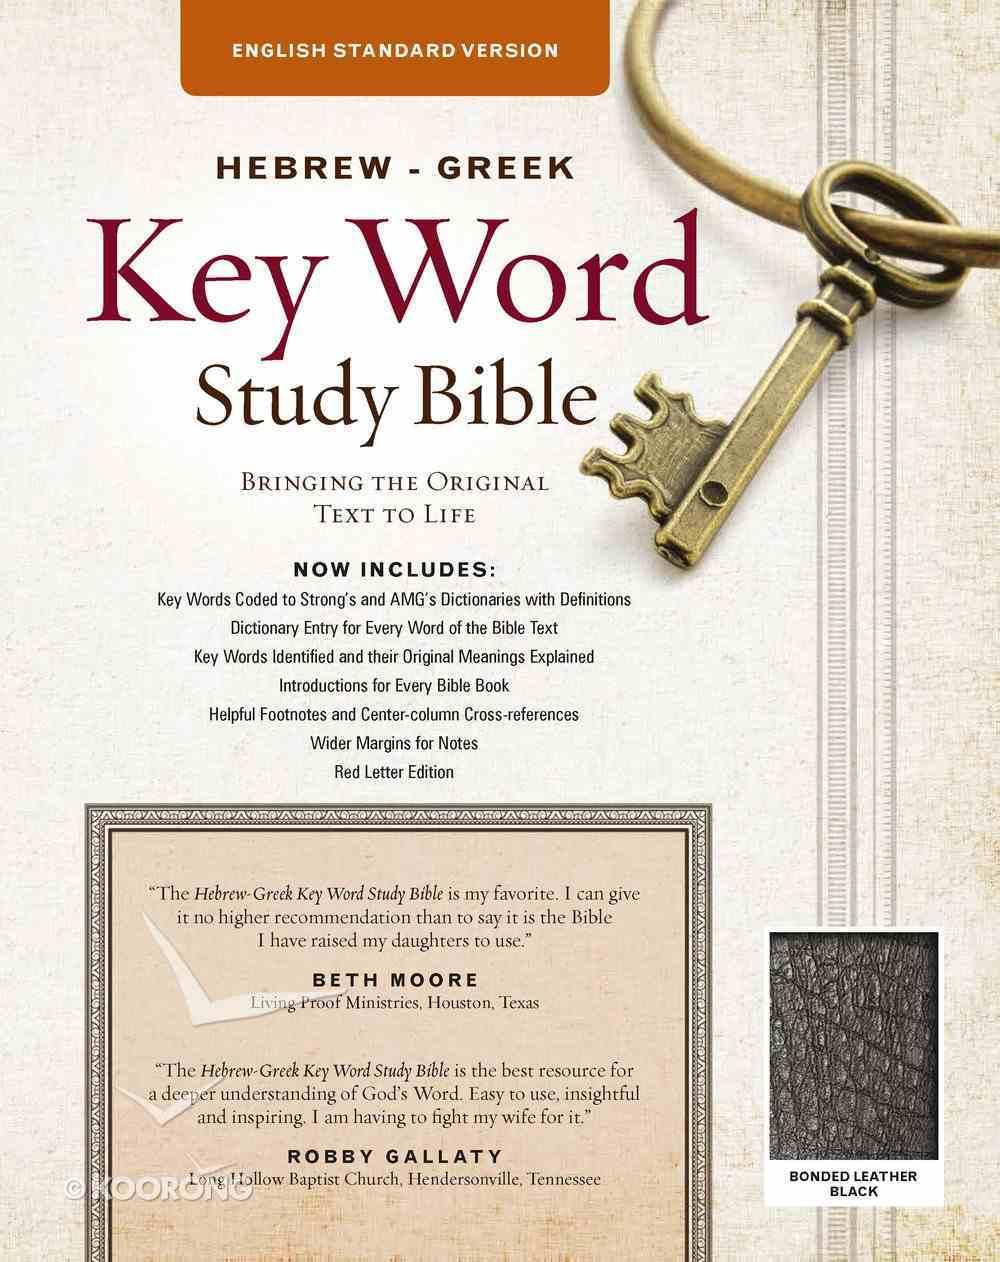 The ESV Hebrew-Greek Key Word Study Bible (Black) Bonded Leather